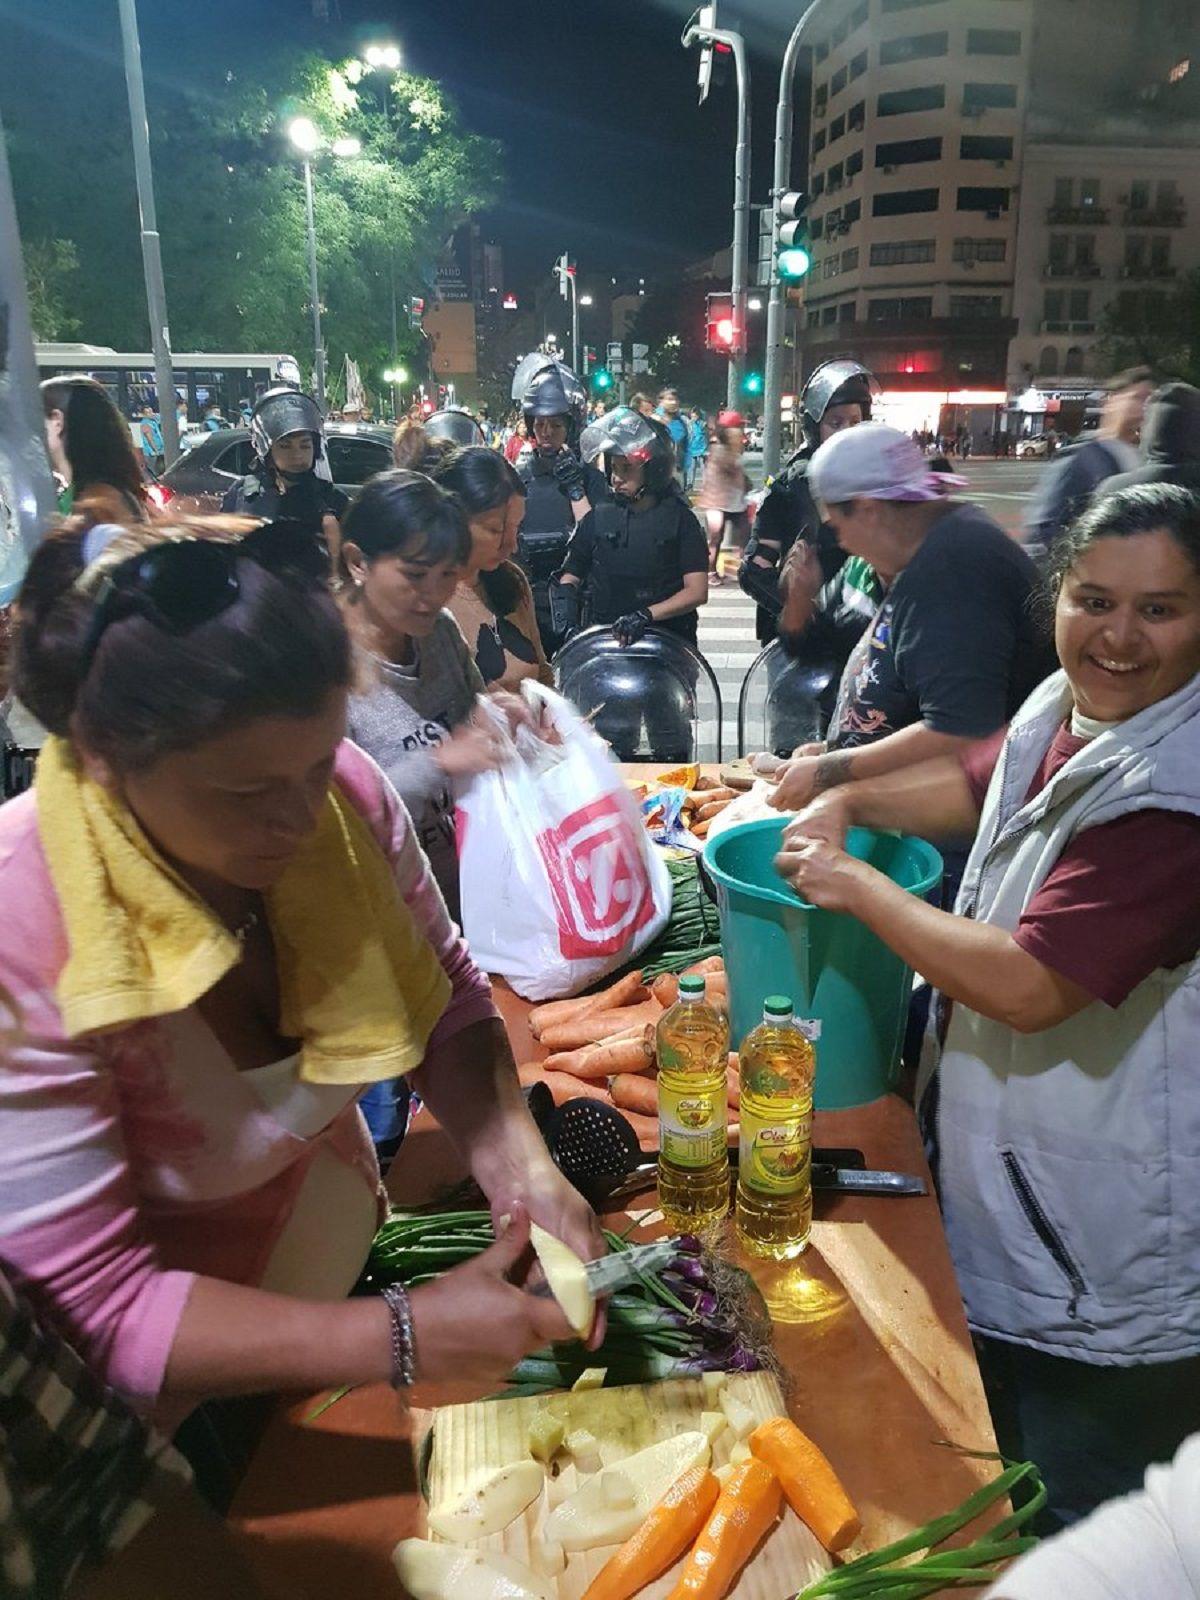 Acampe de Barrios de Pie frente a Desarrollo Social - Crédito:@BarriosdePieCap